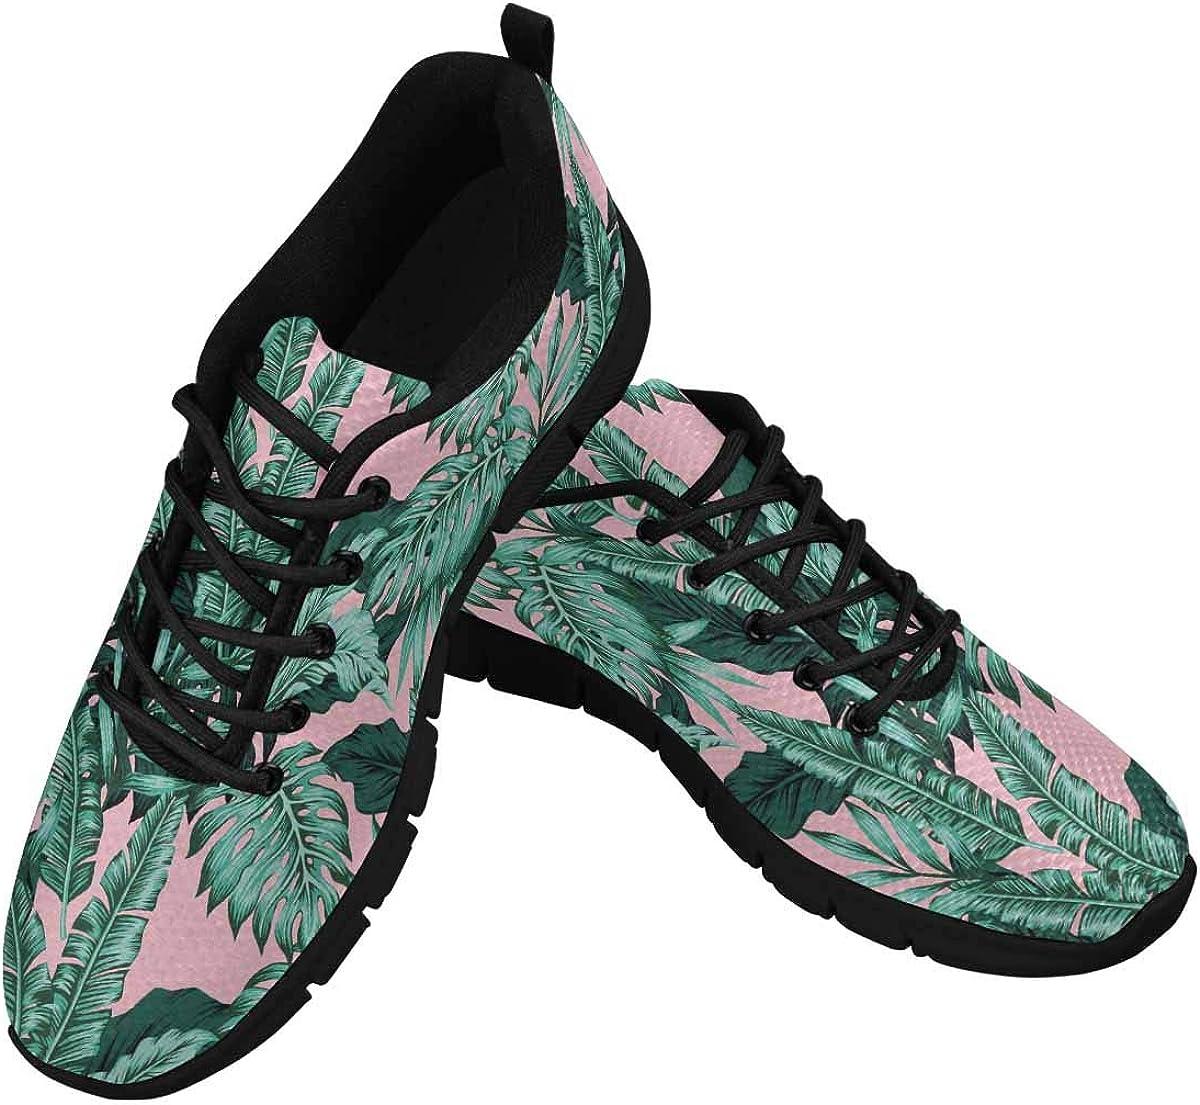 InterestPrint Tropical Leaves Women's Athletic Walking Shoes Comfort Mesh Non Slip